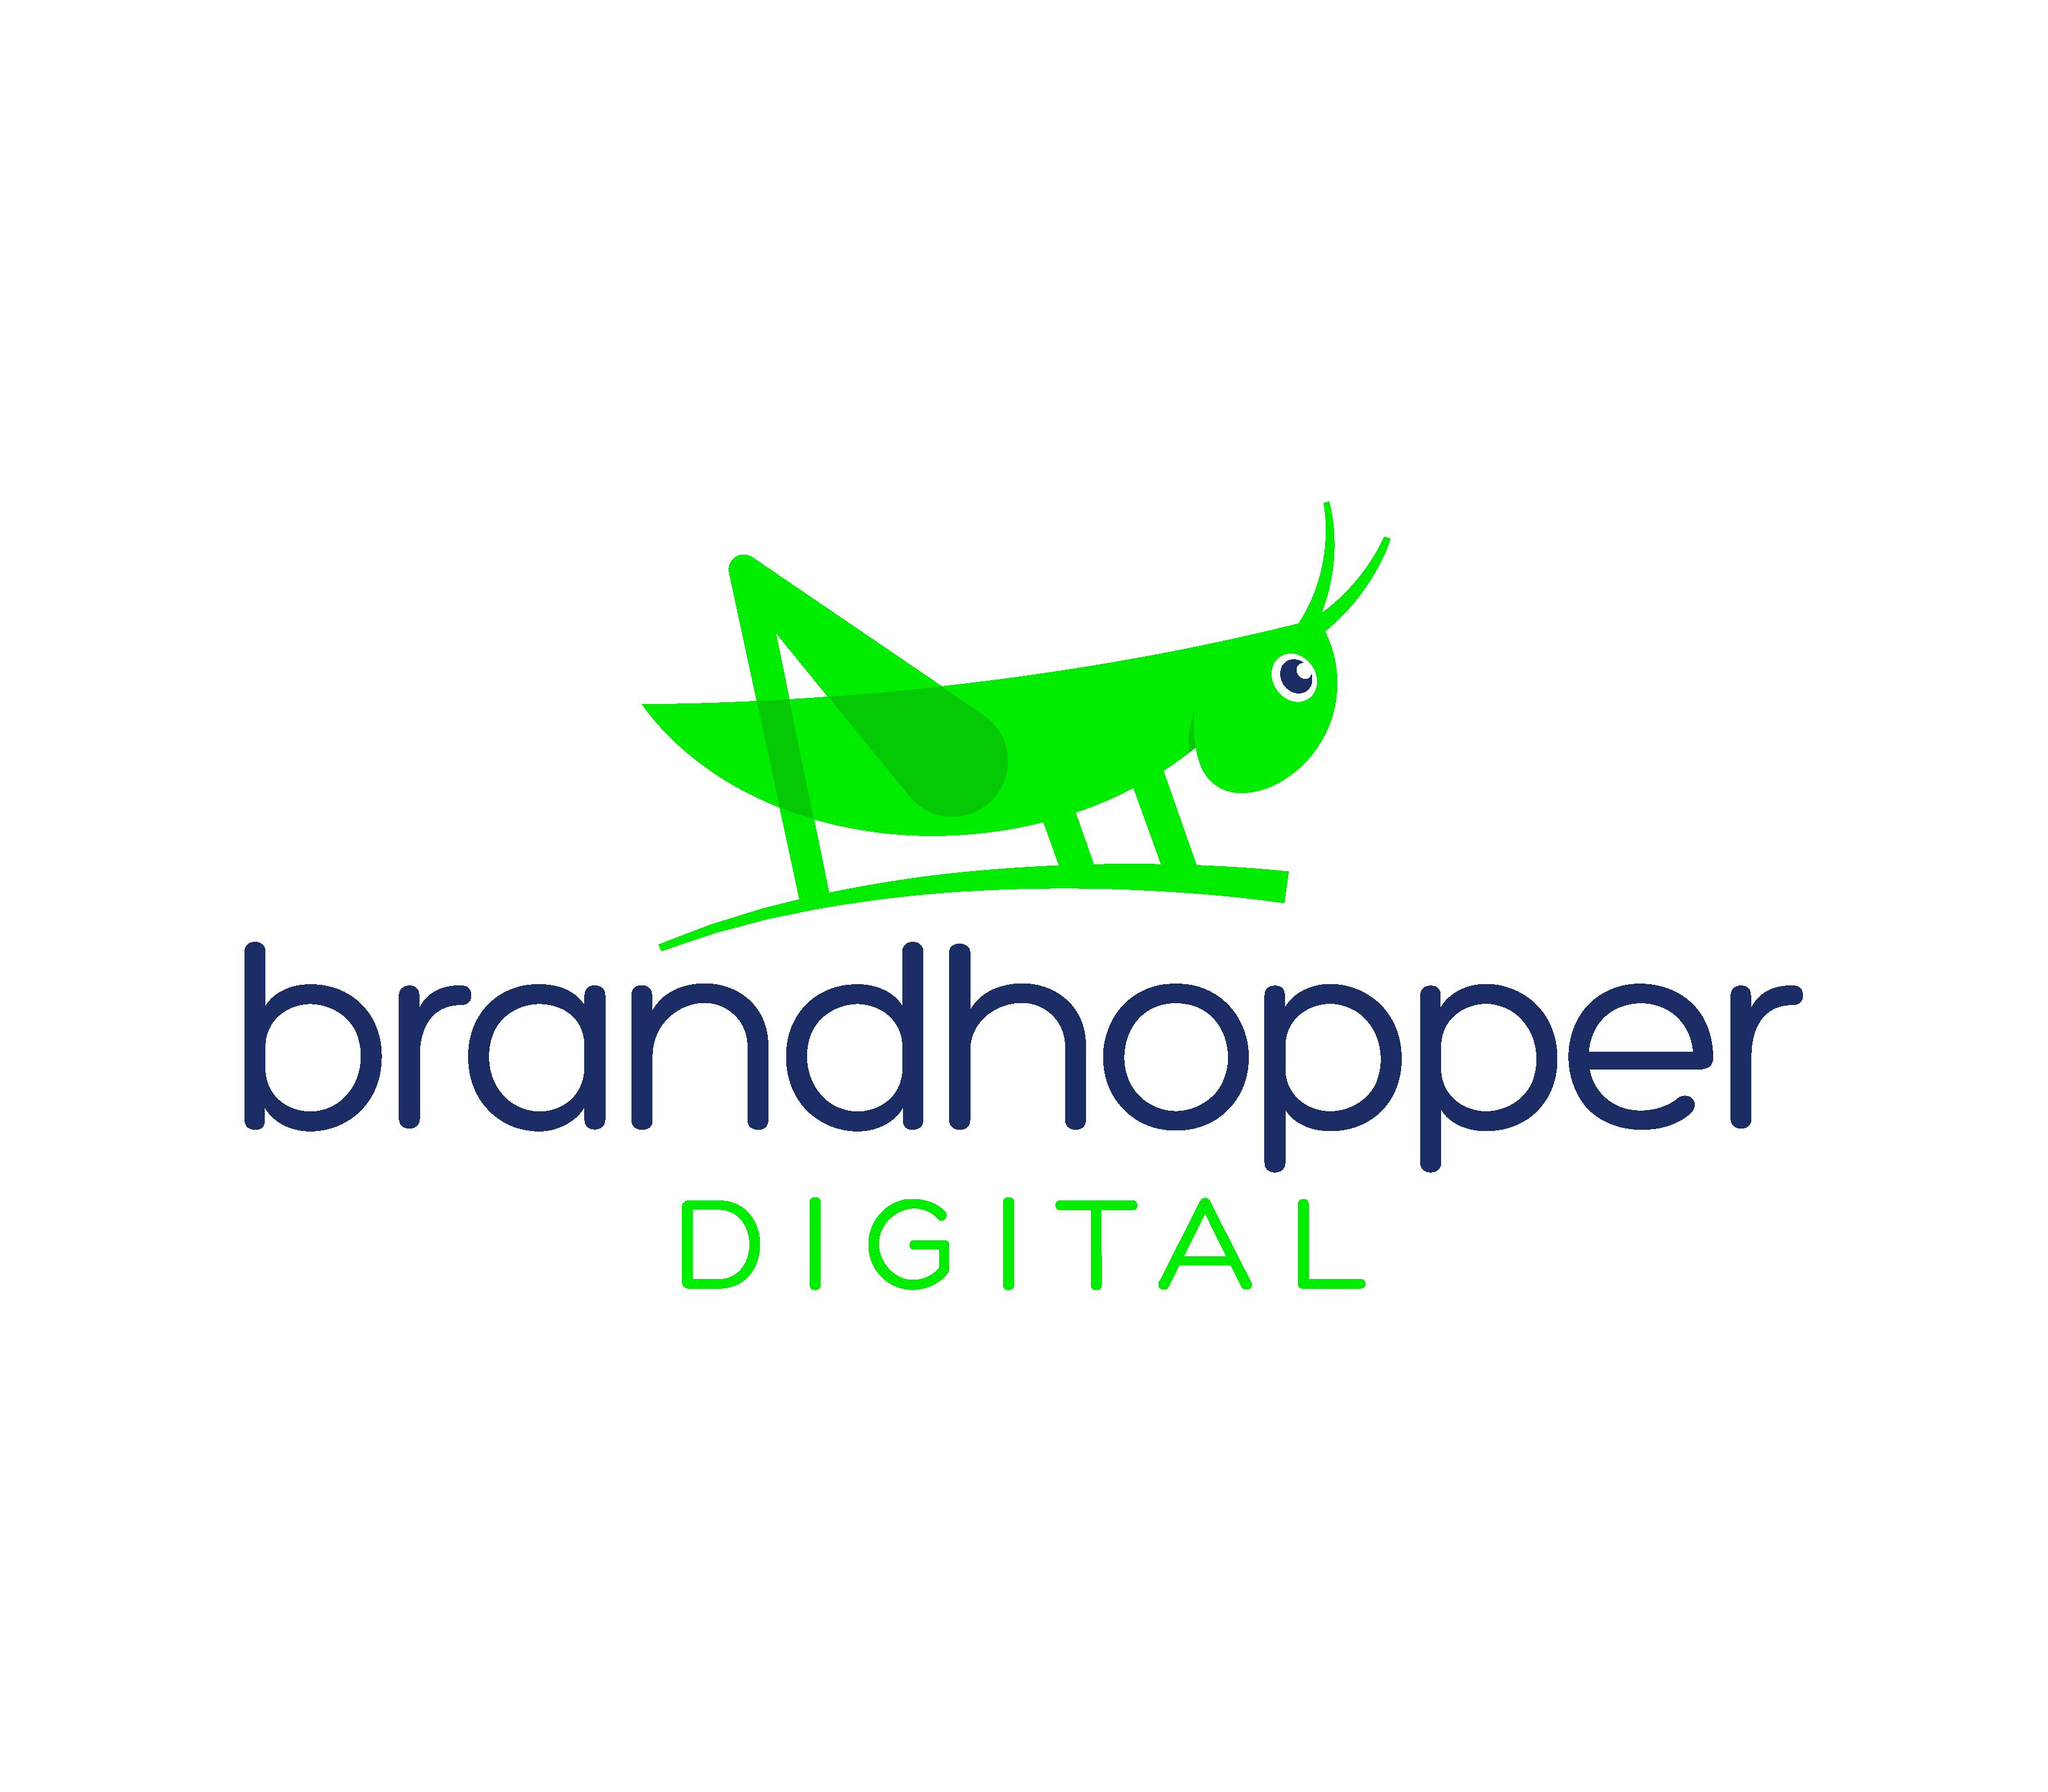 Brandhopper Digital Logo